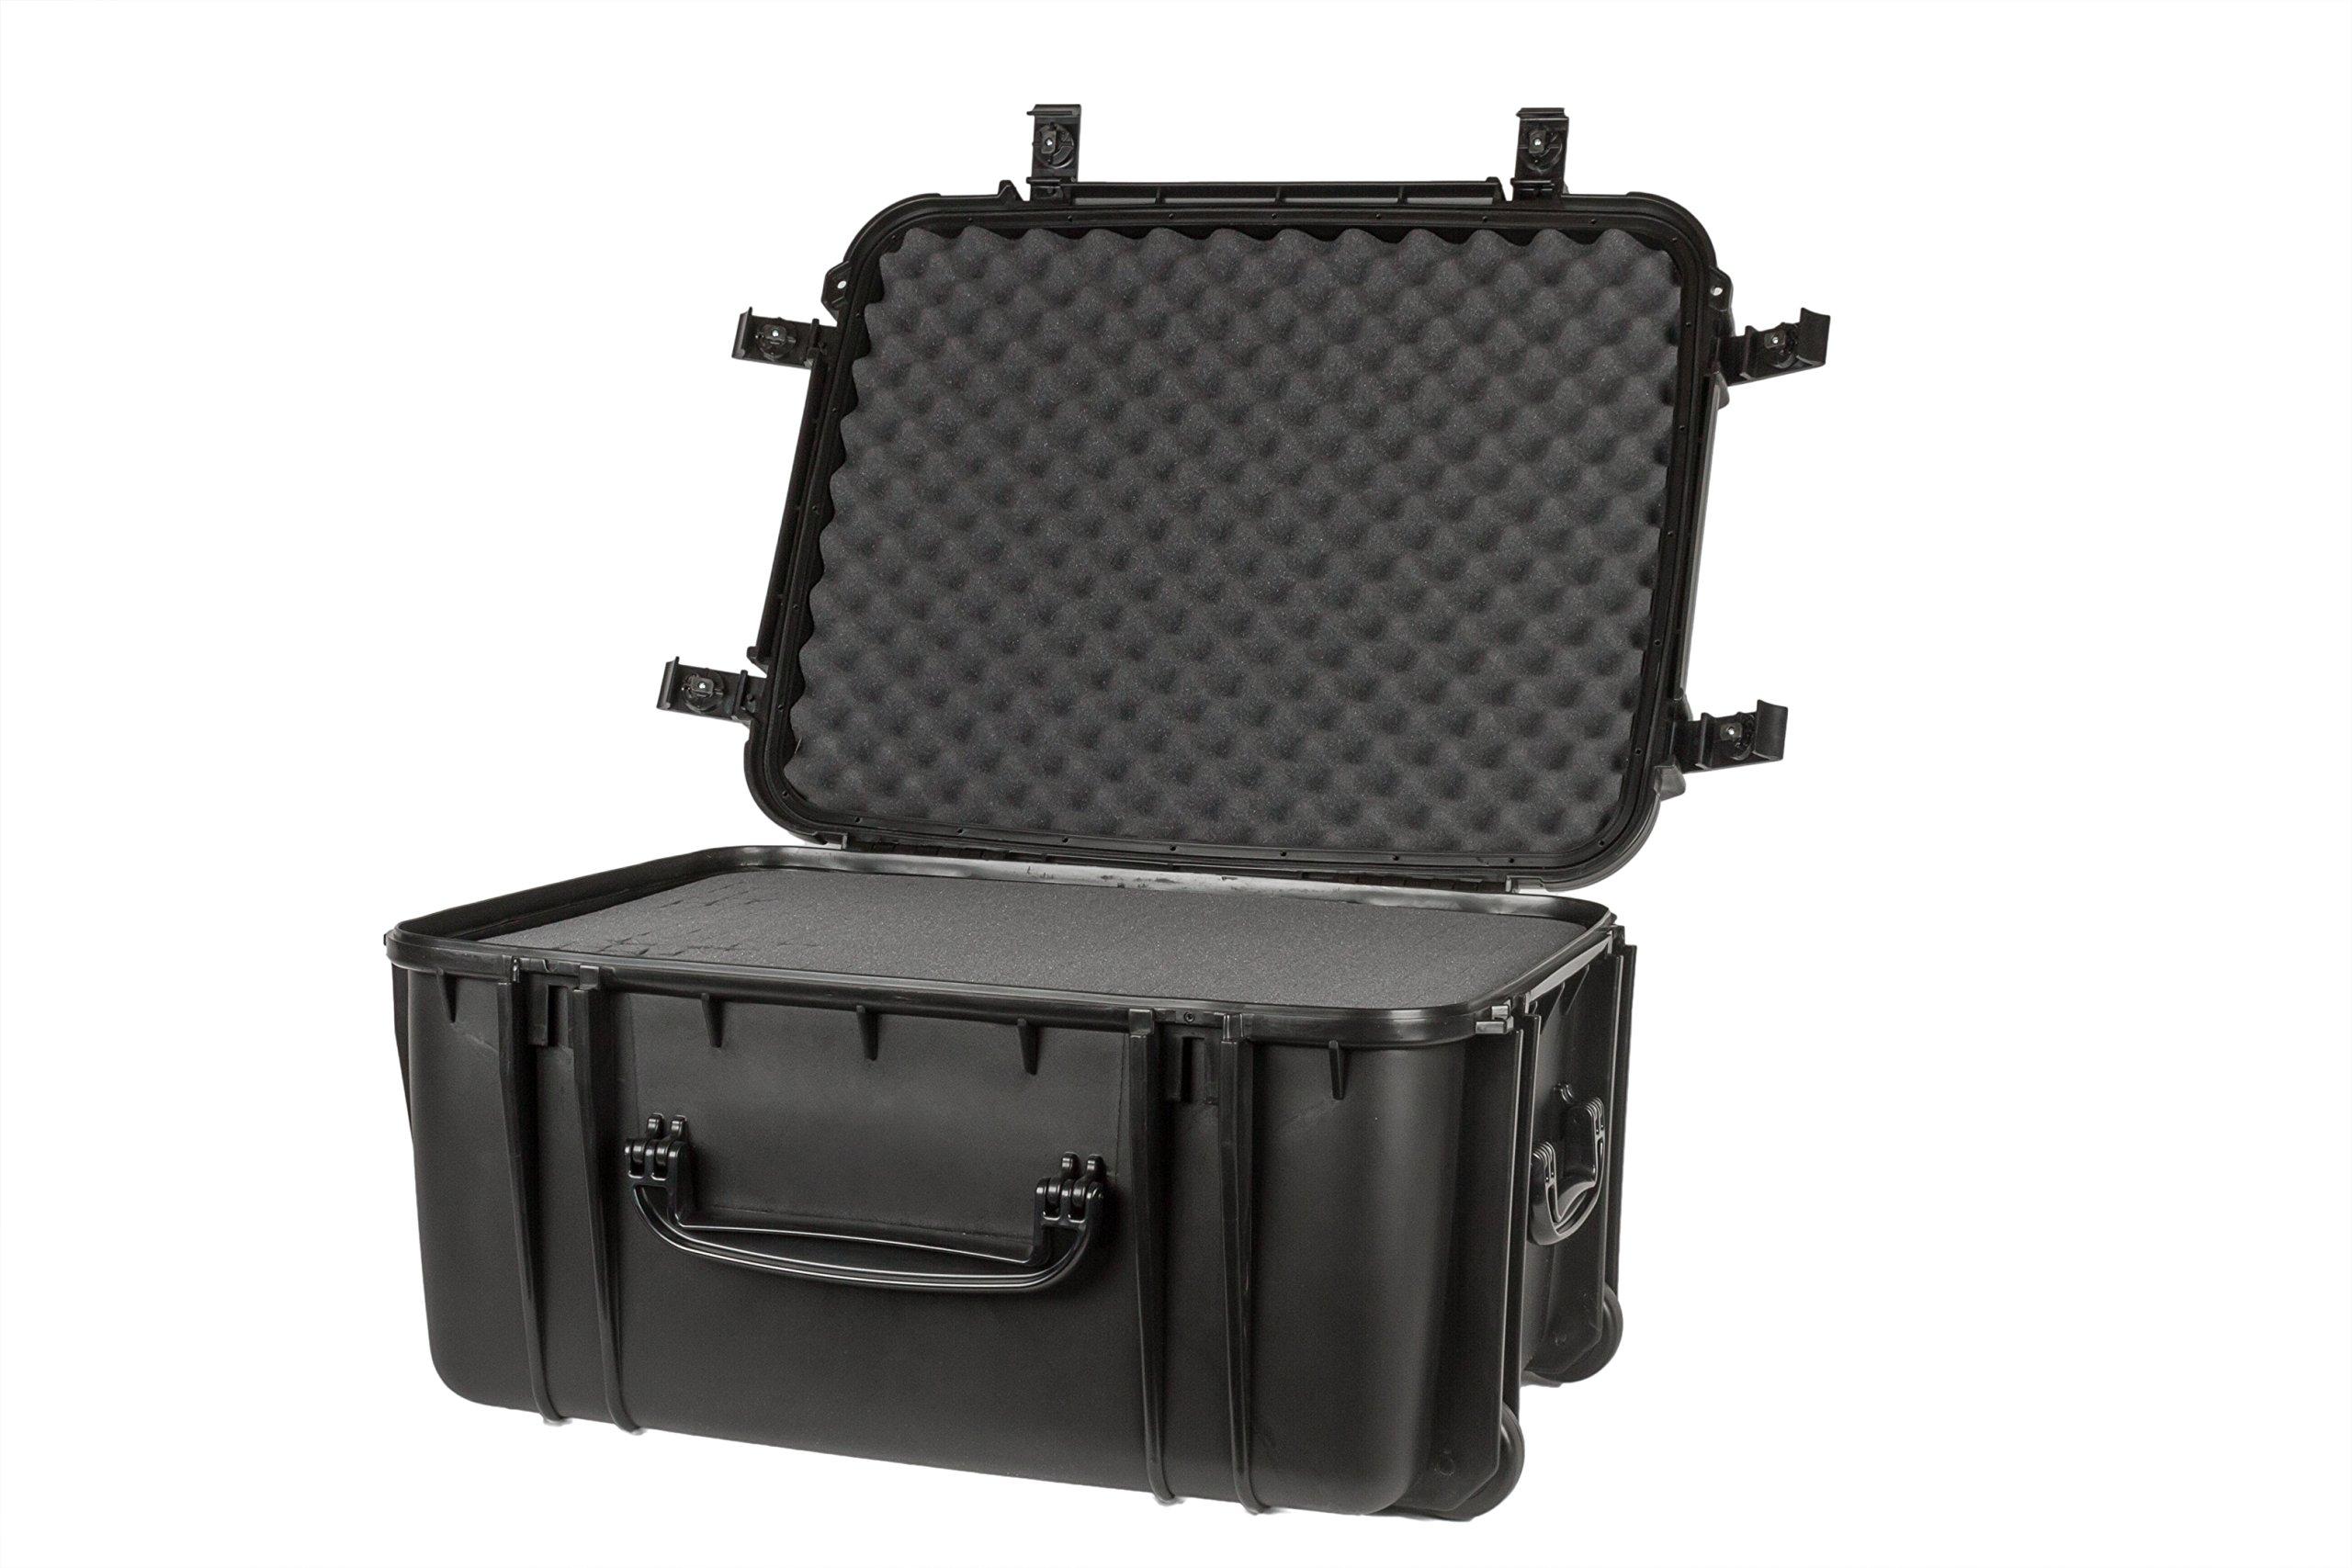 Seahorse SE1220 Protective Wheeled Case with Foam (Black)